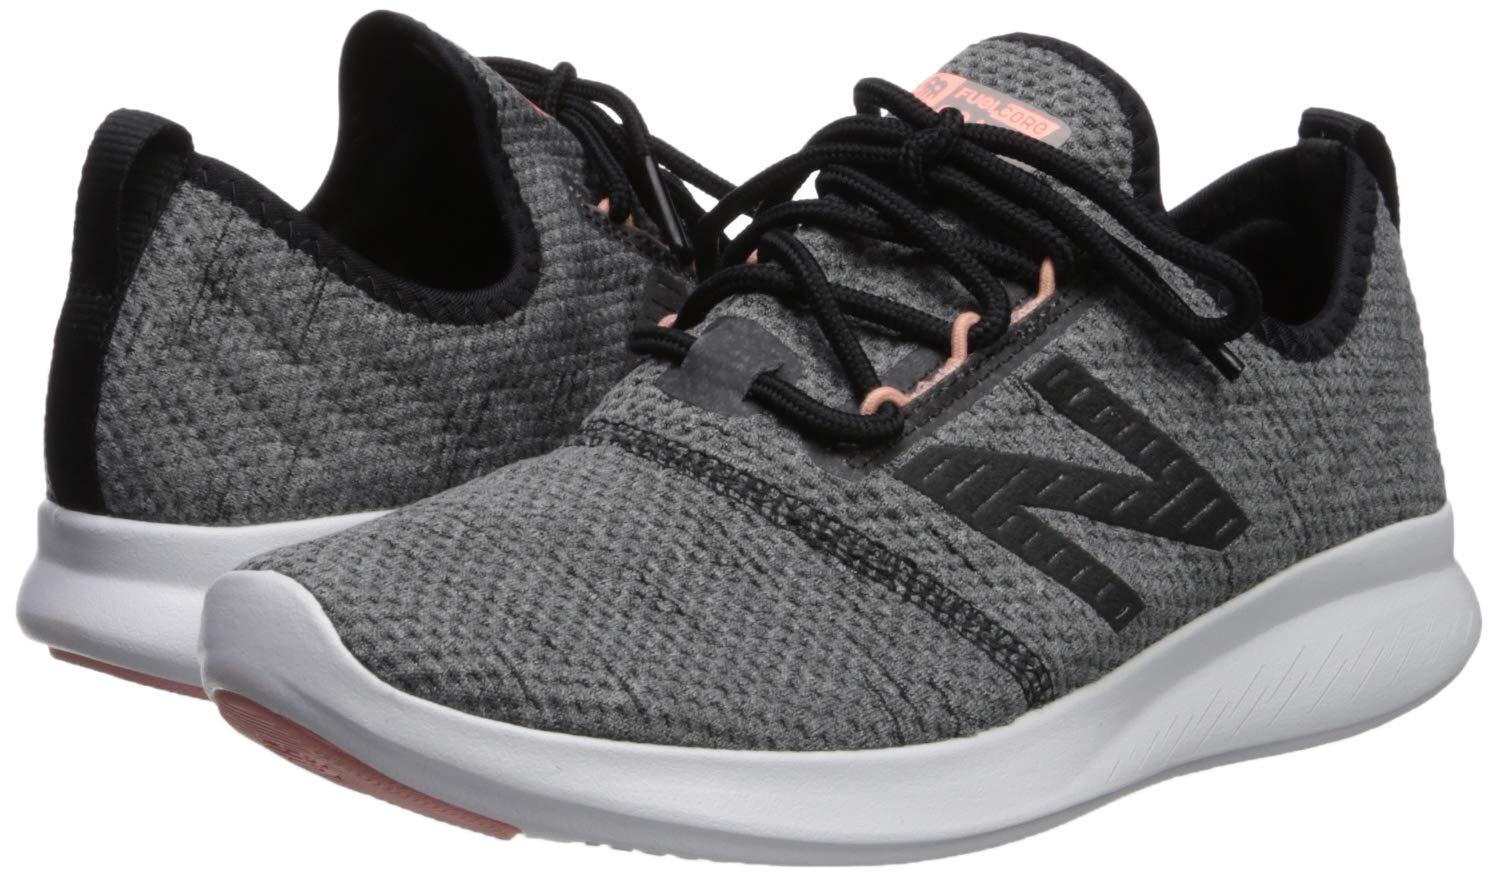 71OMaw8nEdL - New Balance Women's Fuel Core Coast V4 Running Shoes